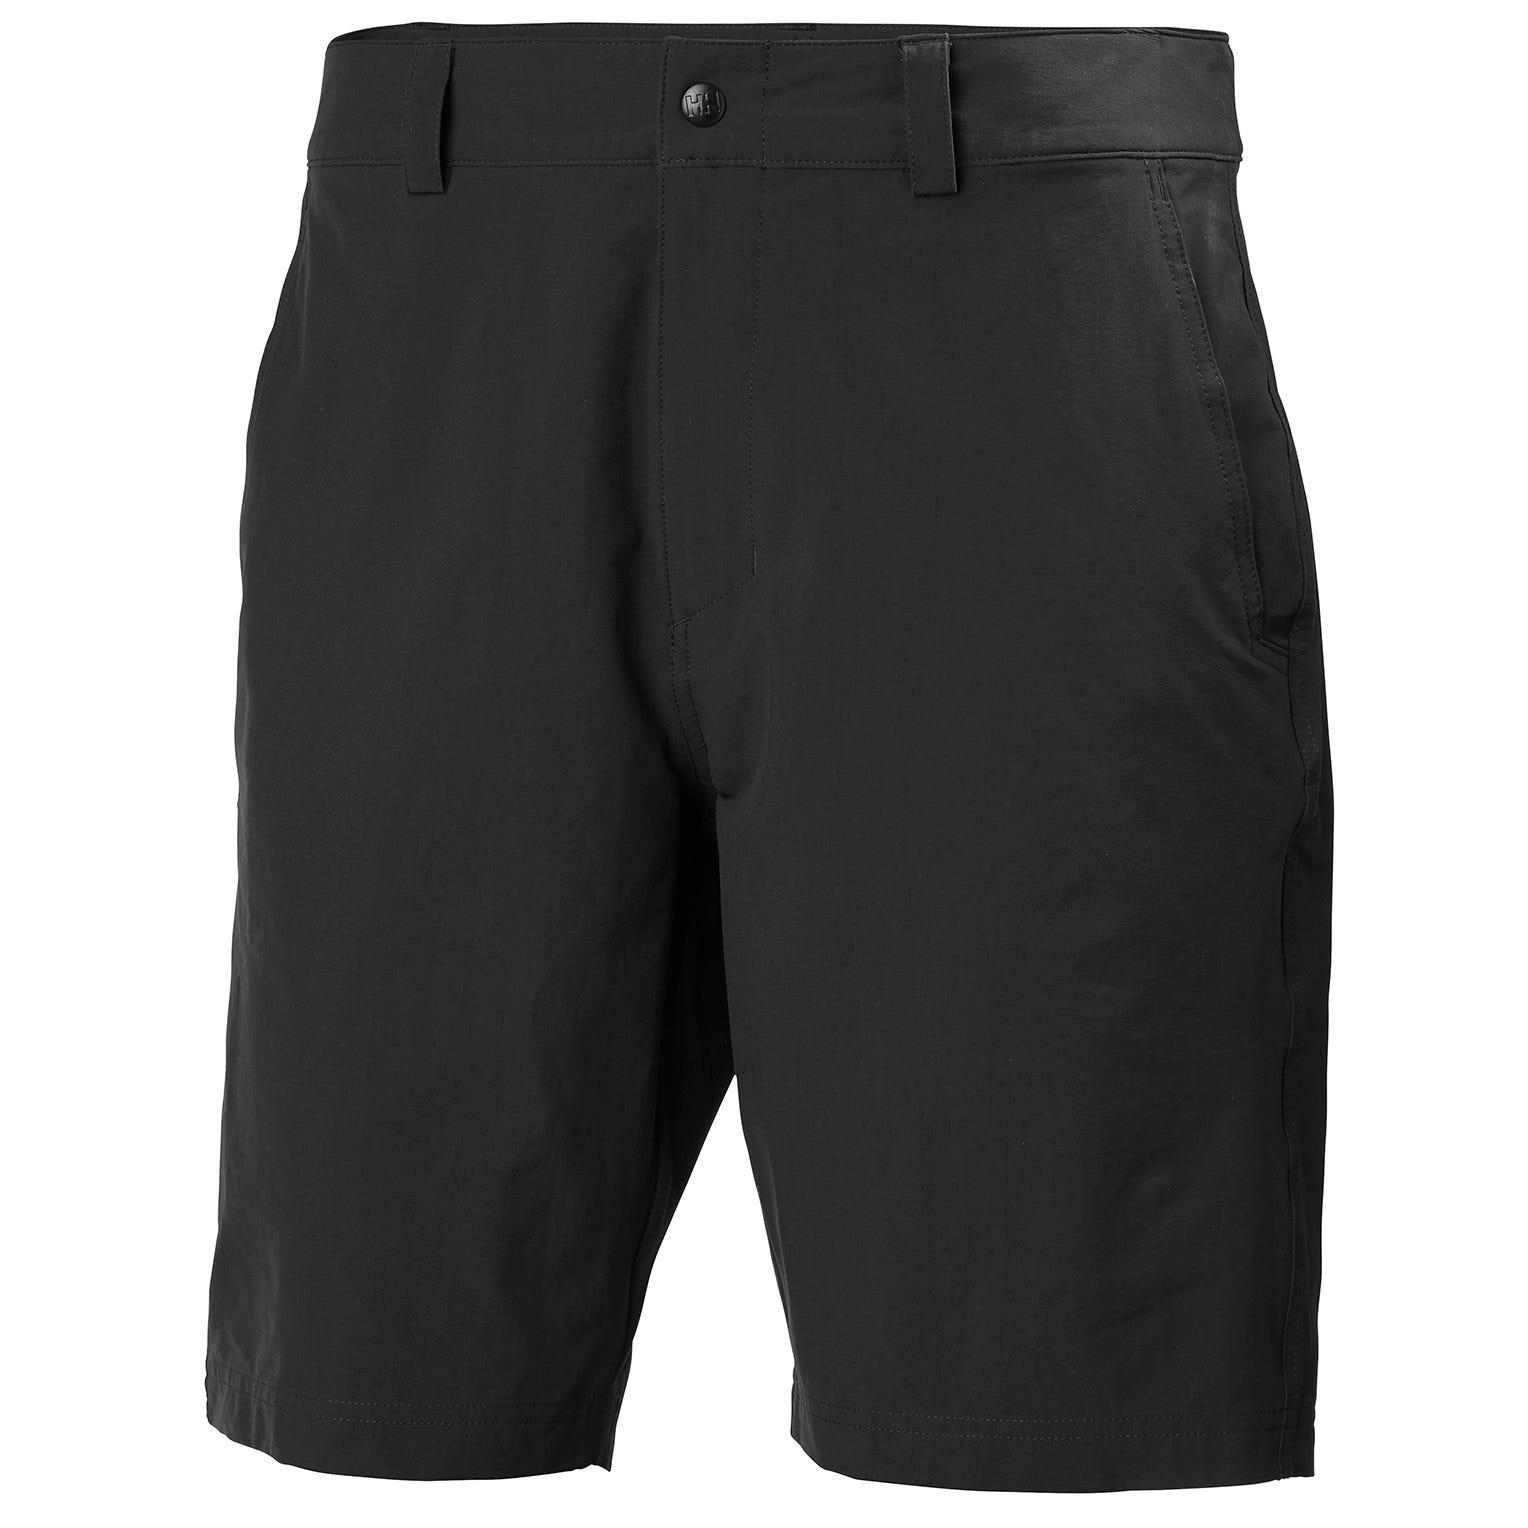 "Helly Hansen Hp Qd Club Shorts 10"" Mens Sailing Pant Black 30"